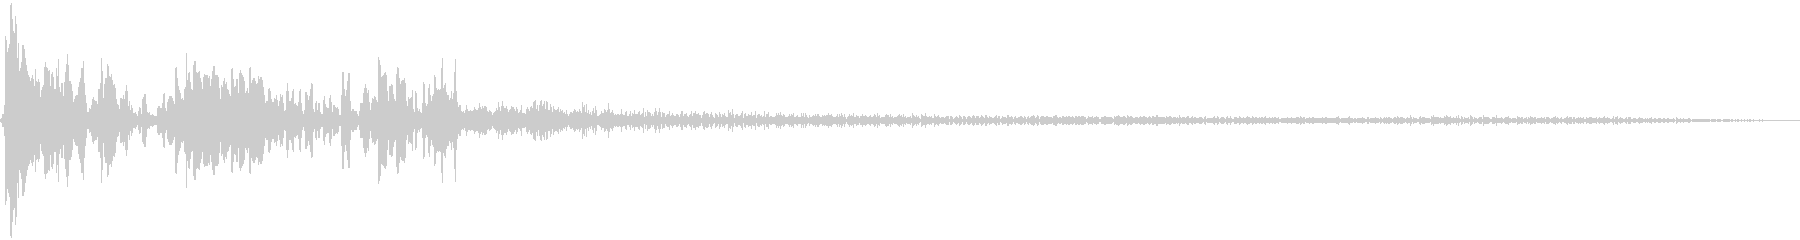 【SF】ワープ_01の未再生の波形